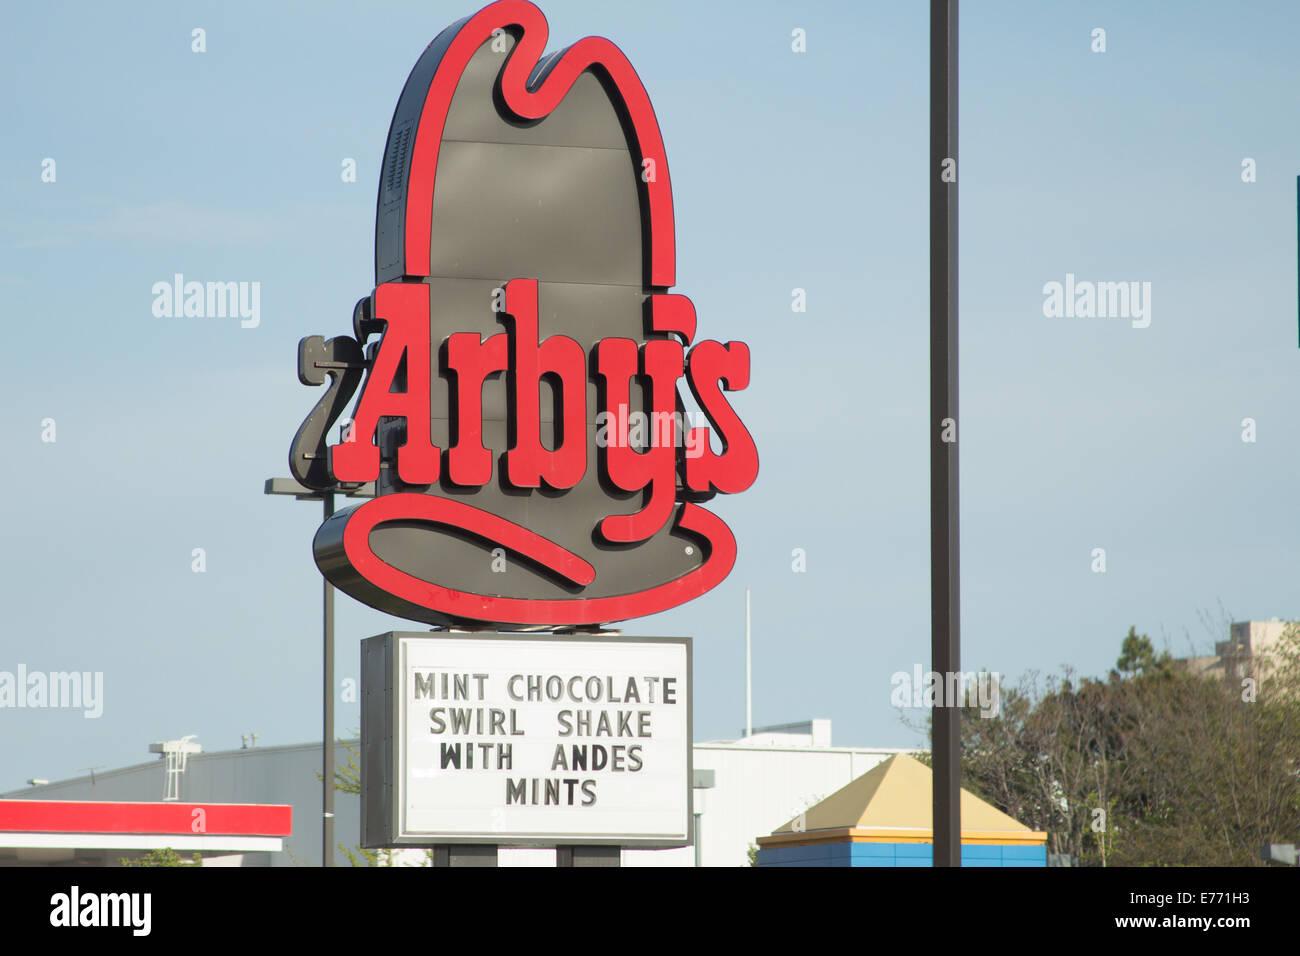 Arby S Funny: Arbys Stock Photos & Arbys Stock Images